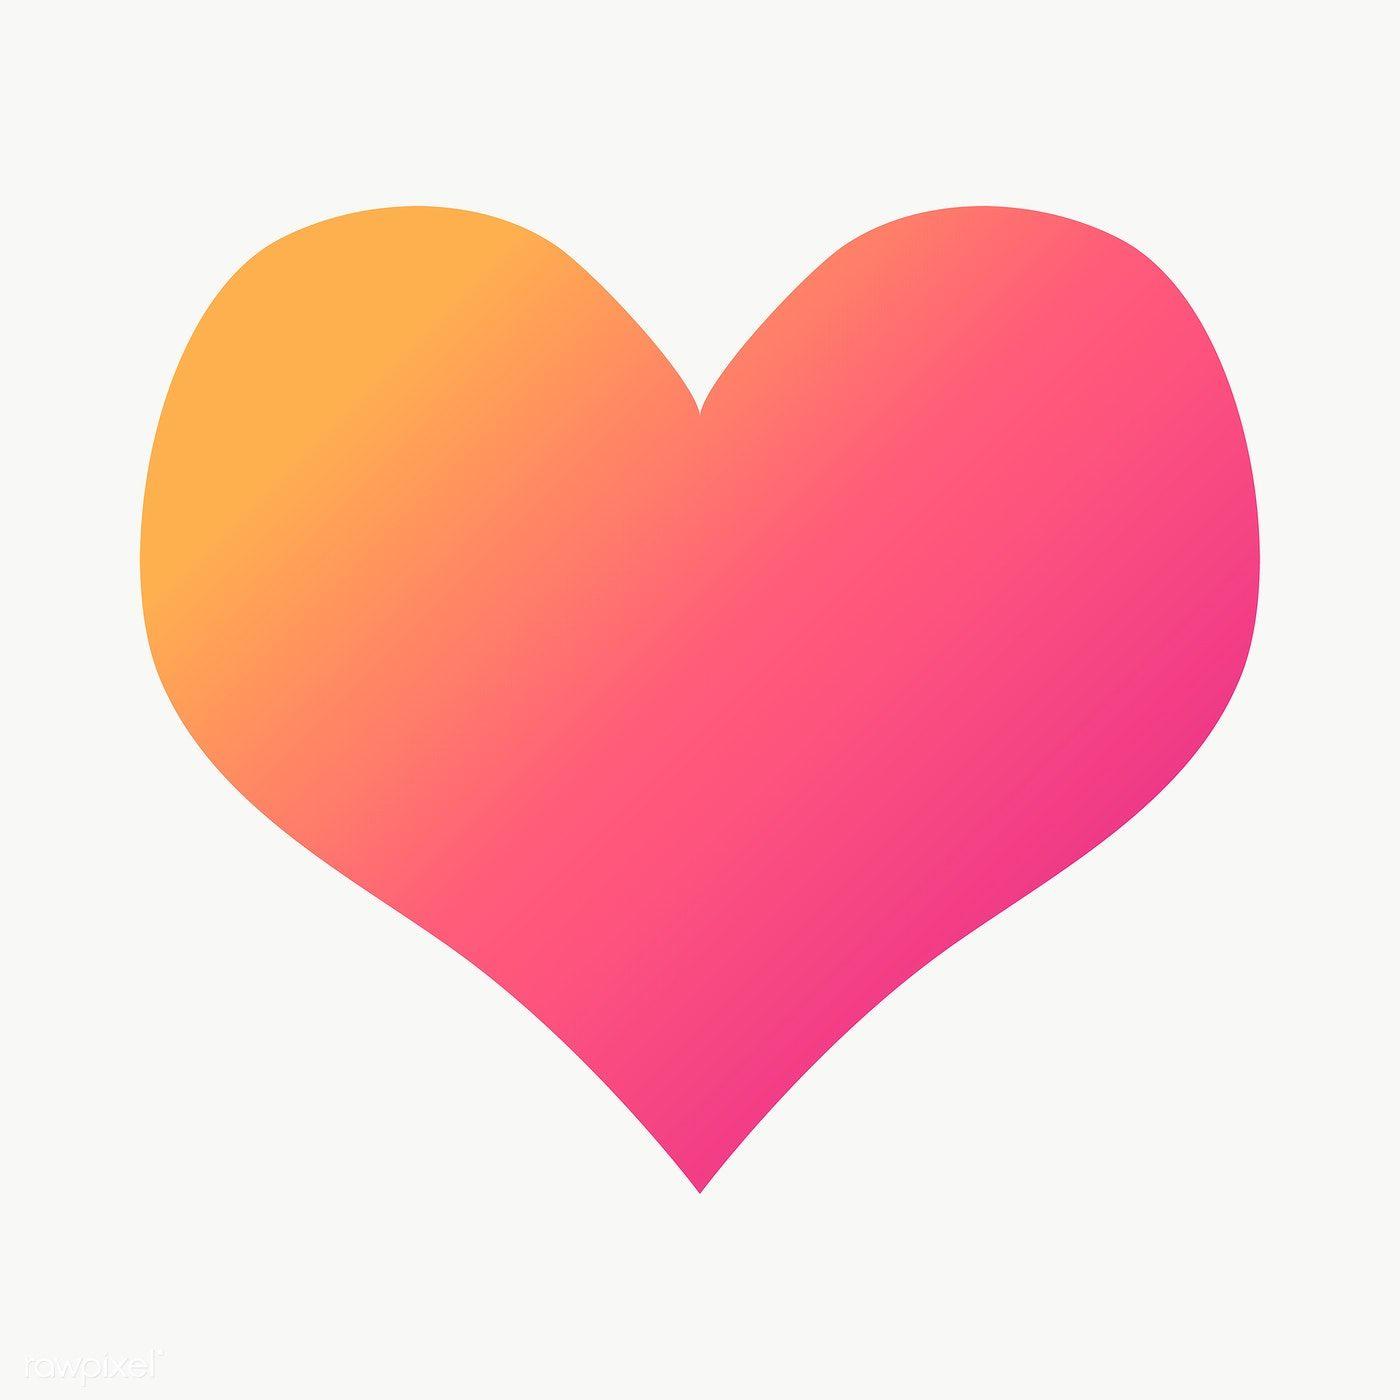 Pink Gradient Heart Geometric Shape Transparent Png Free Image By Rawpixel Com Ningzk V Geometric Shapes Geometric Star Printable Designs